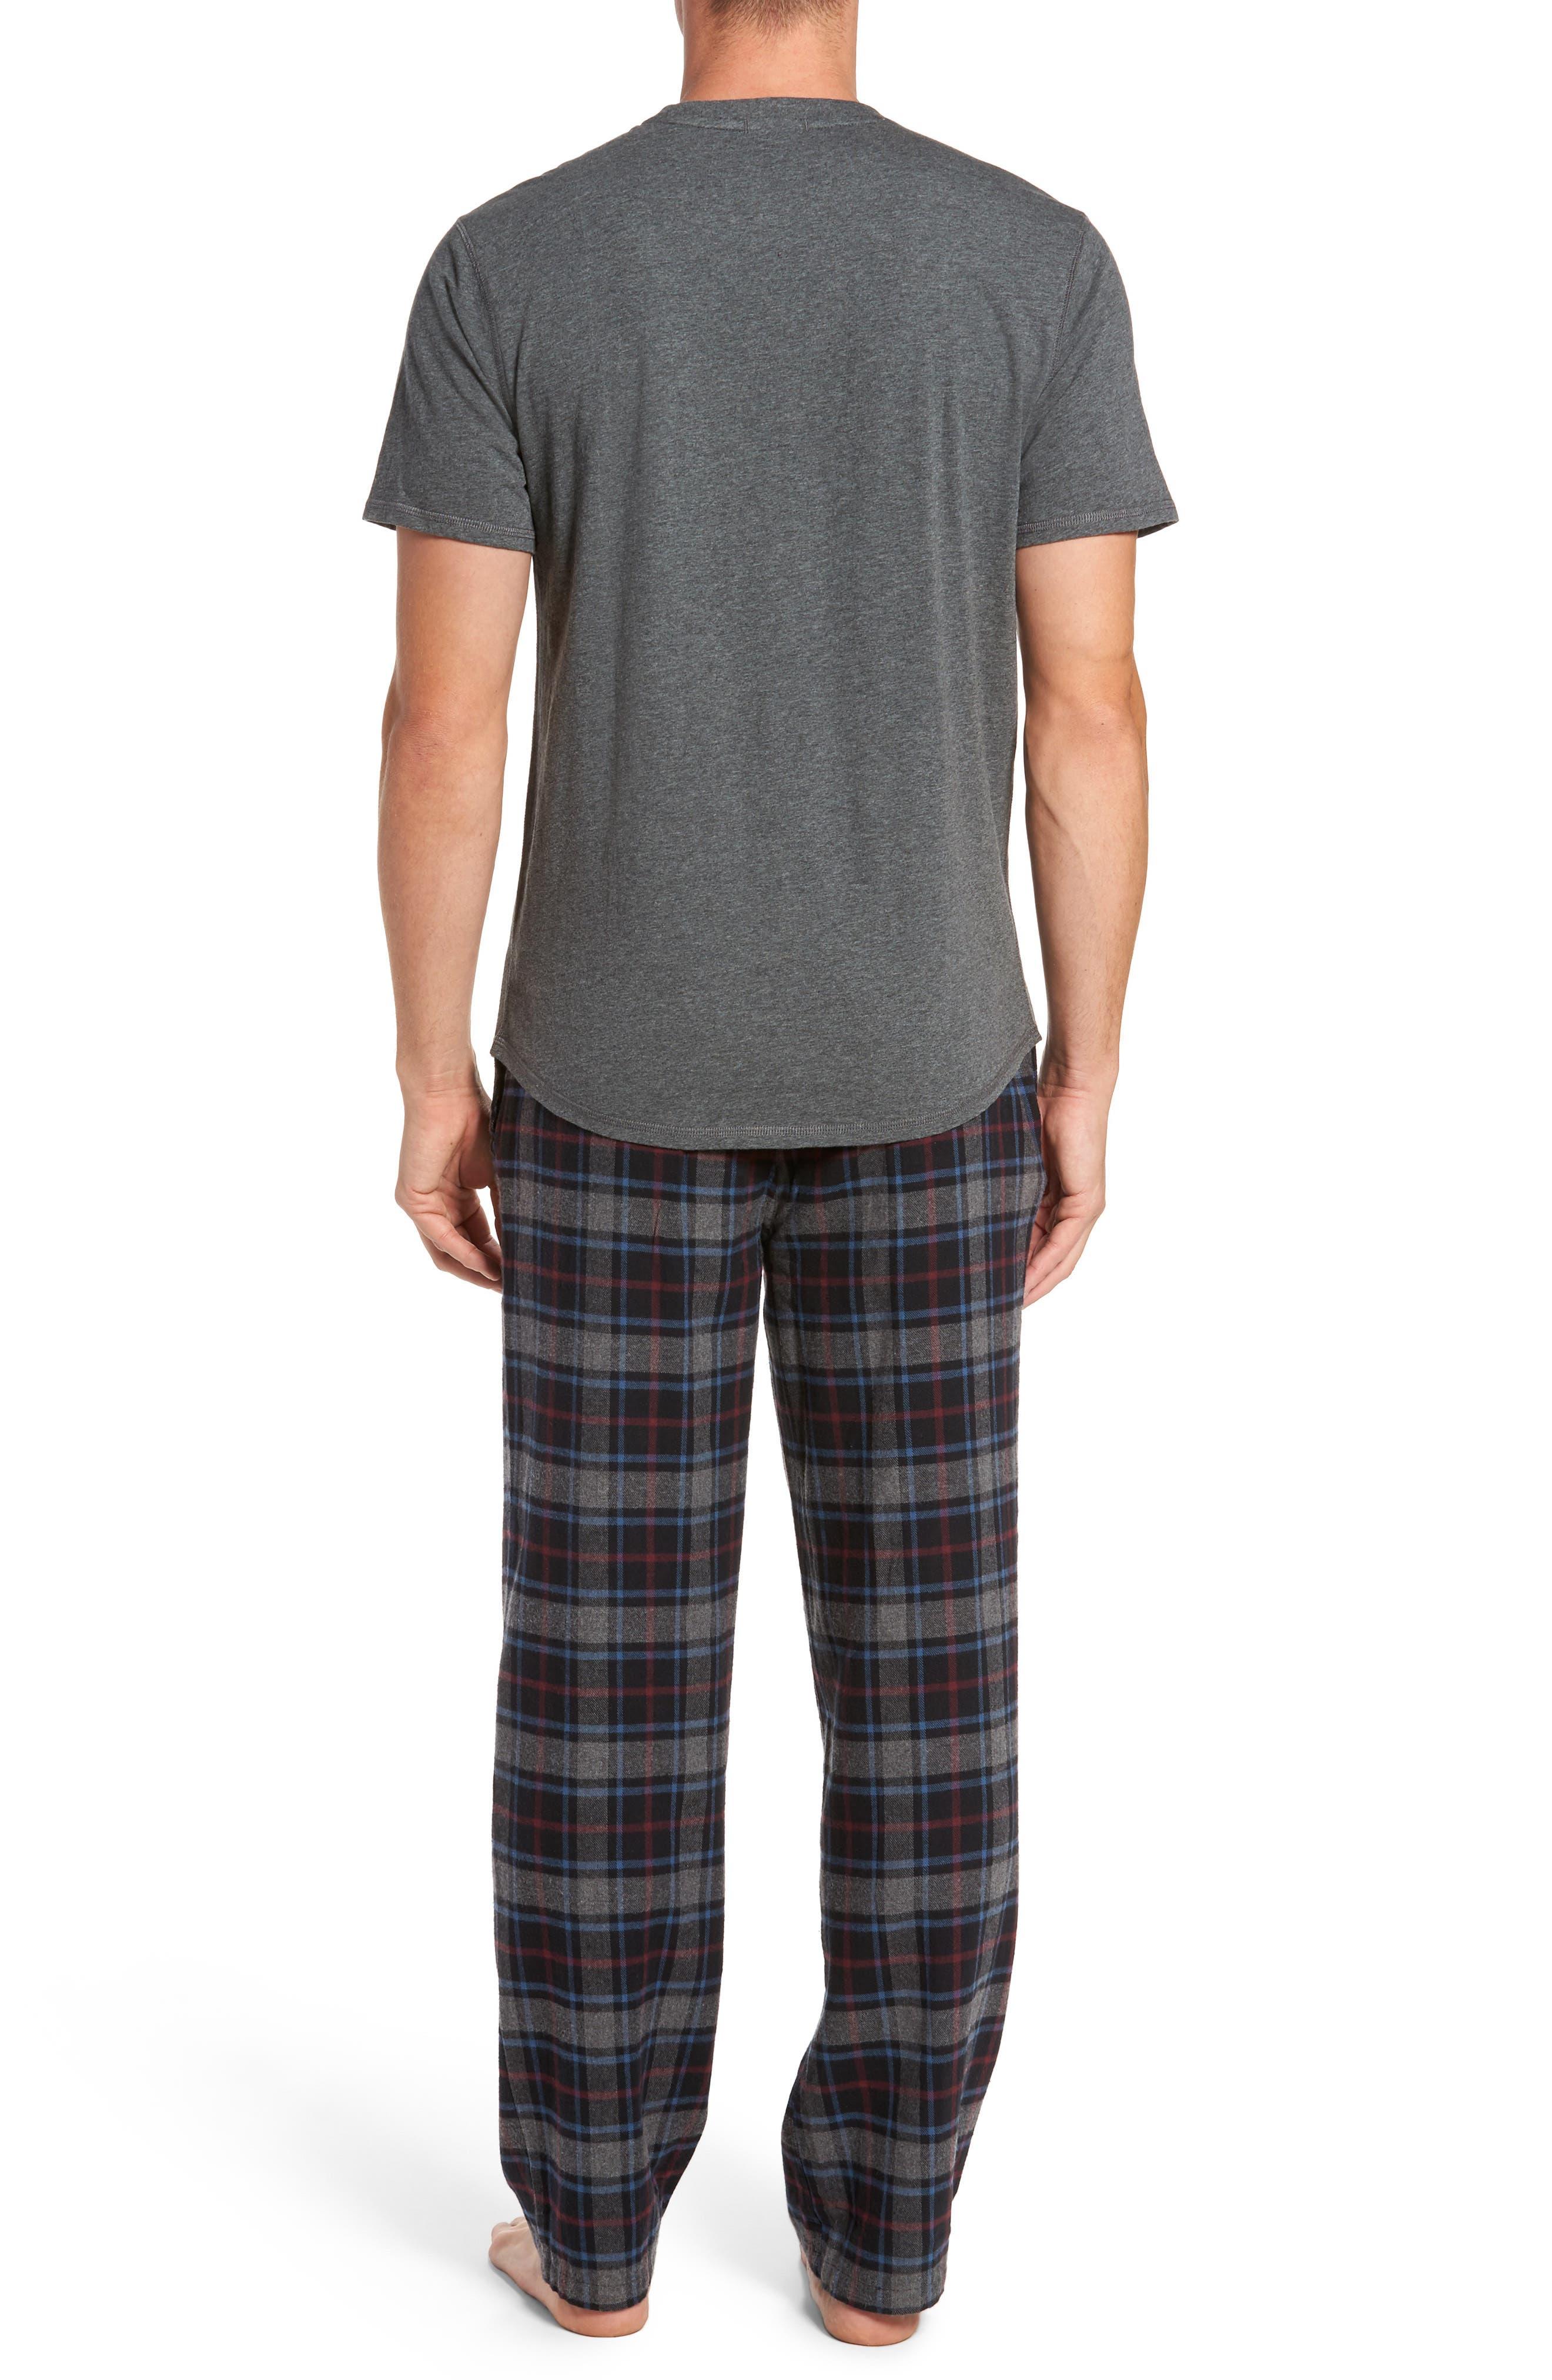 Pajama Set,                             Alternate thumbnail 2, color,                             BLACK ROCK- GREY PLAID